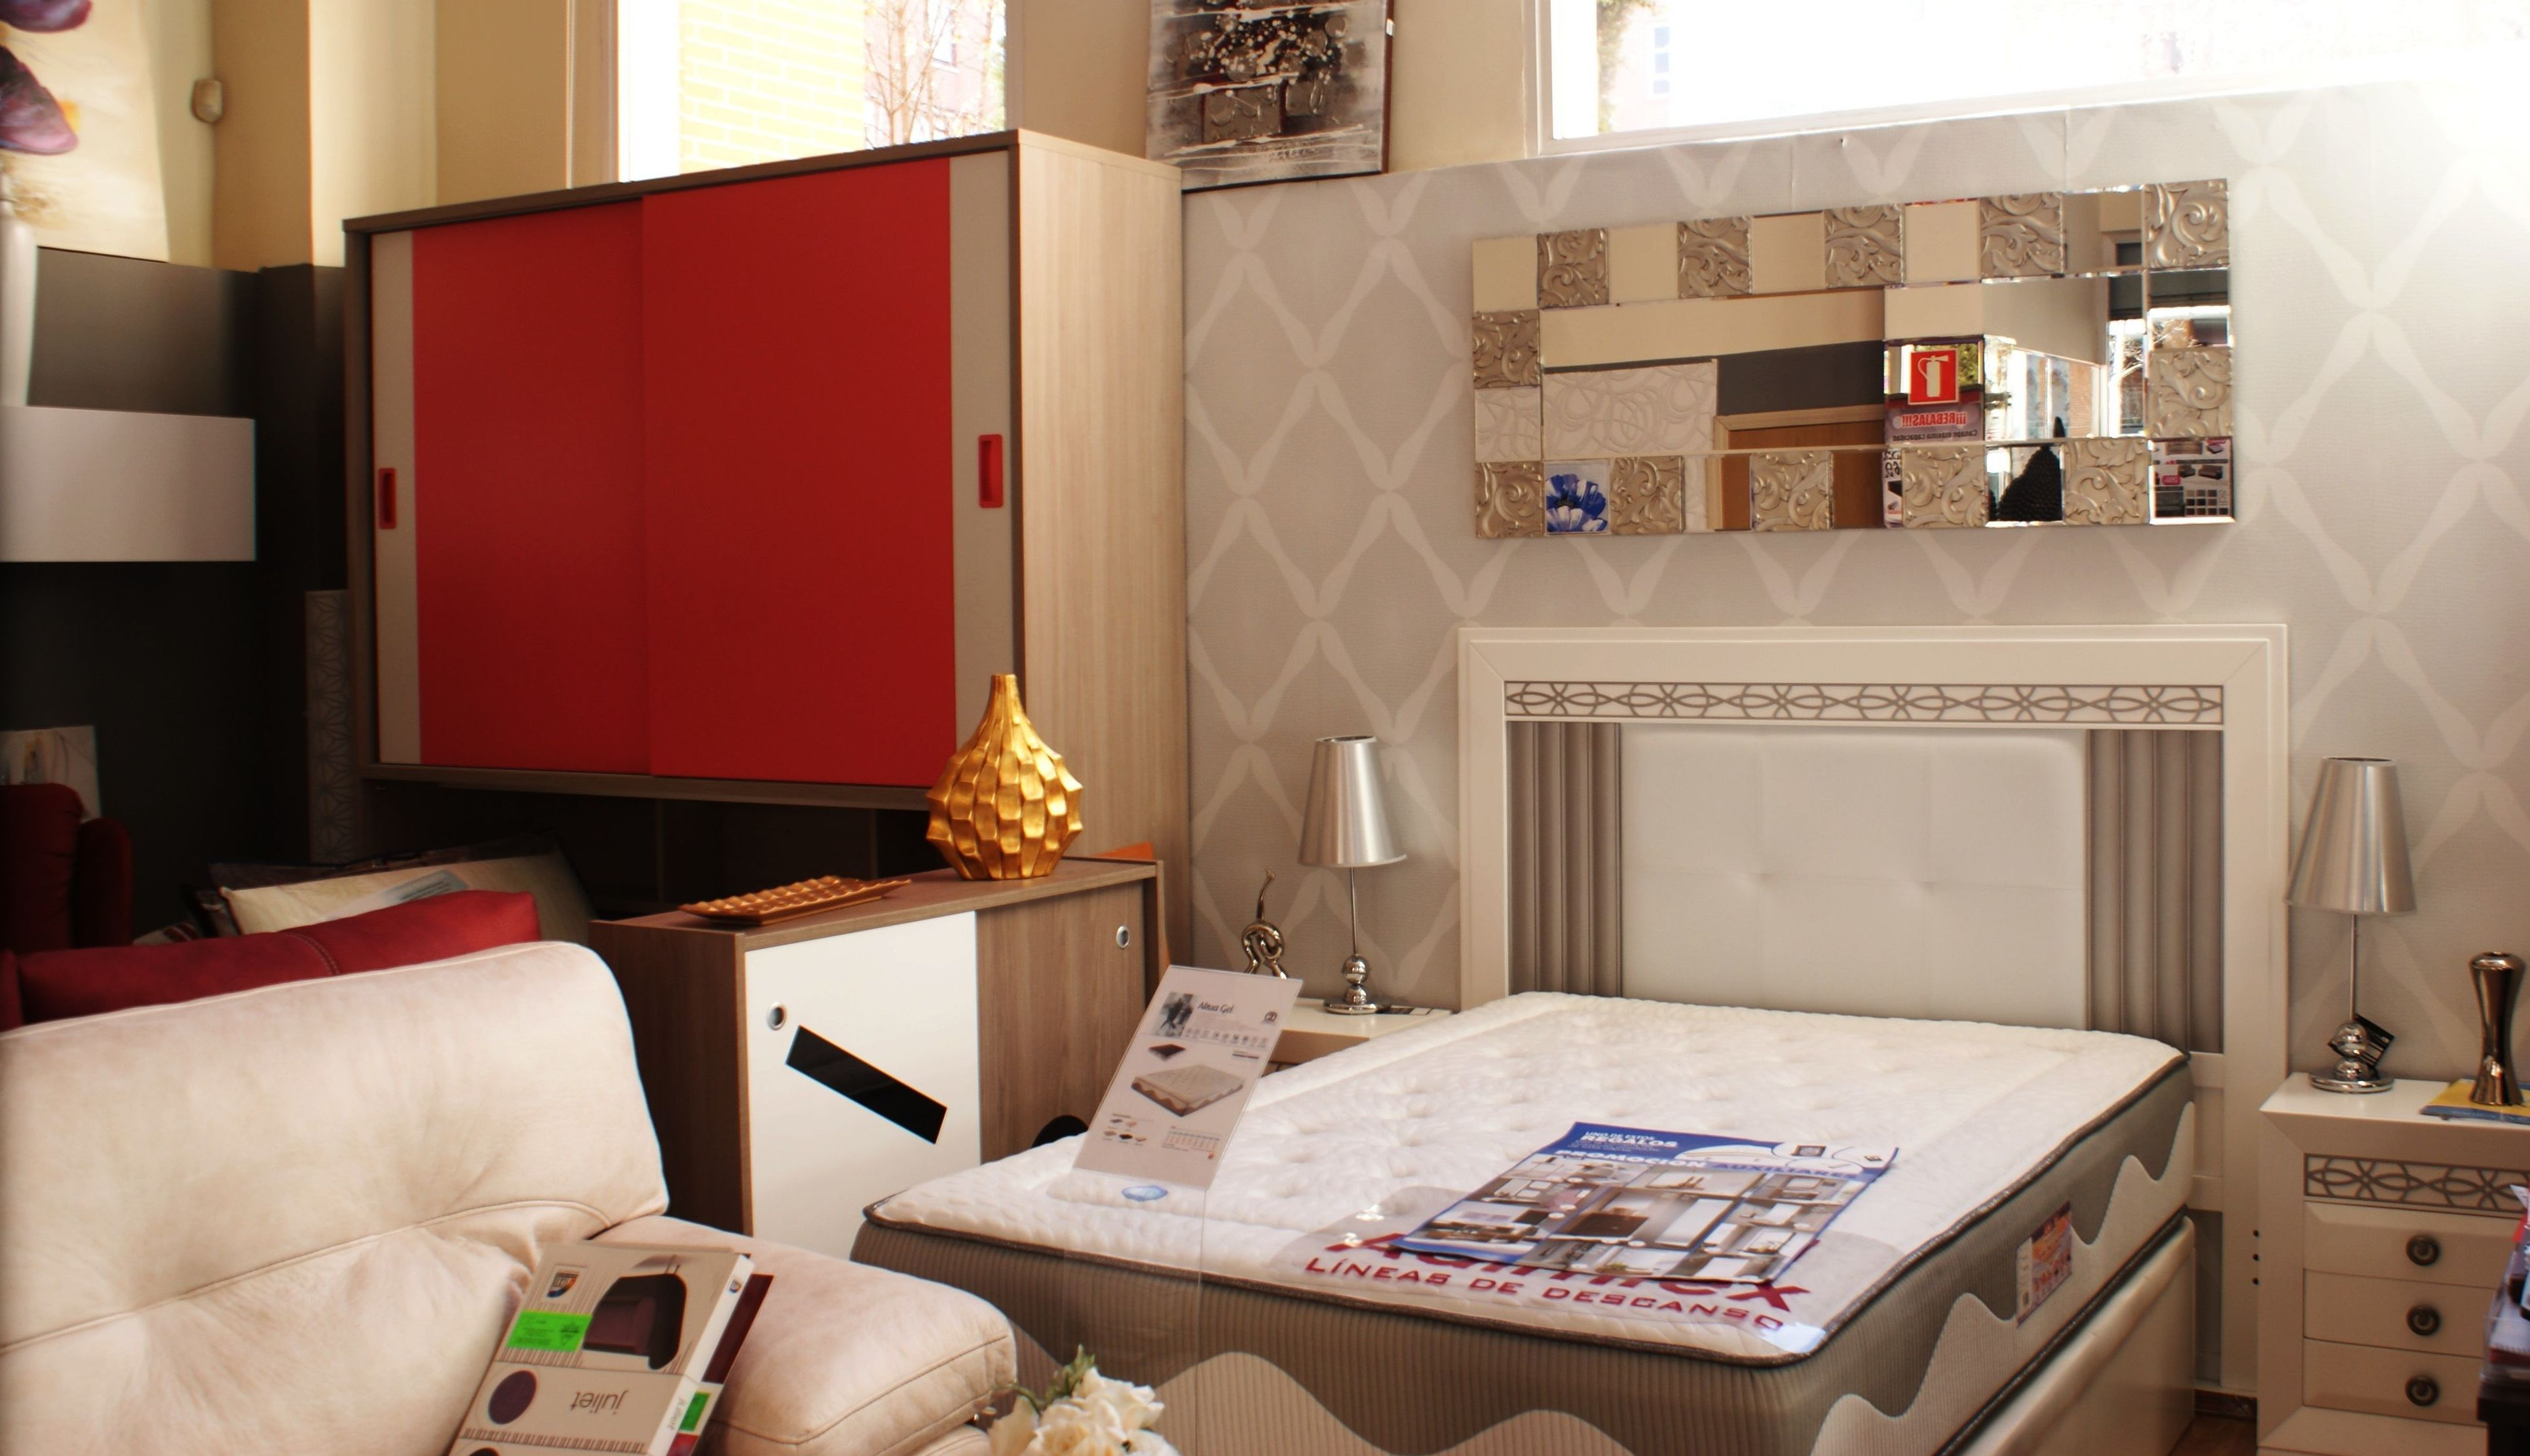 Muebles dormitorio baratos madrid muebles oligom - Muebles antiguos madrid ...